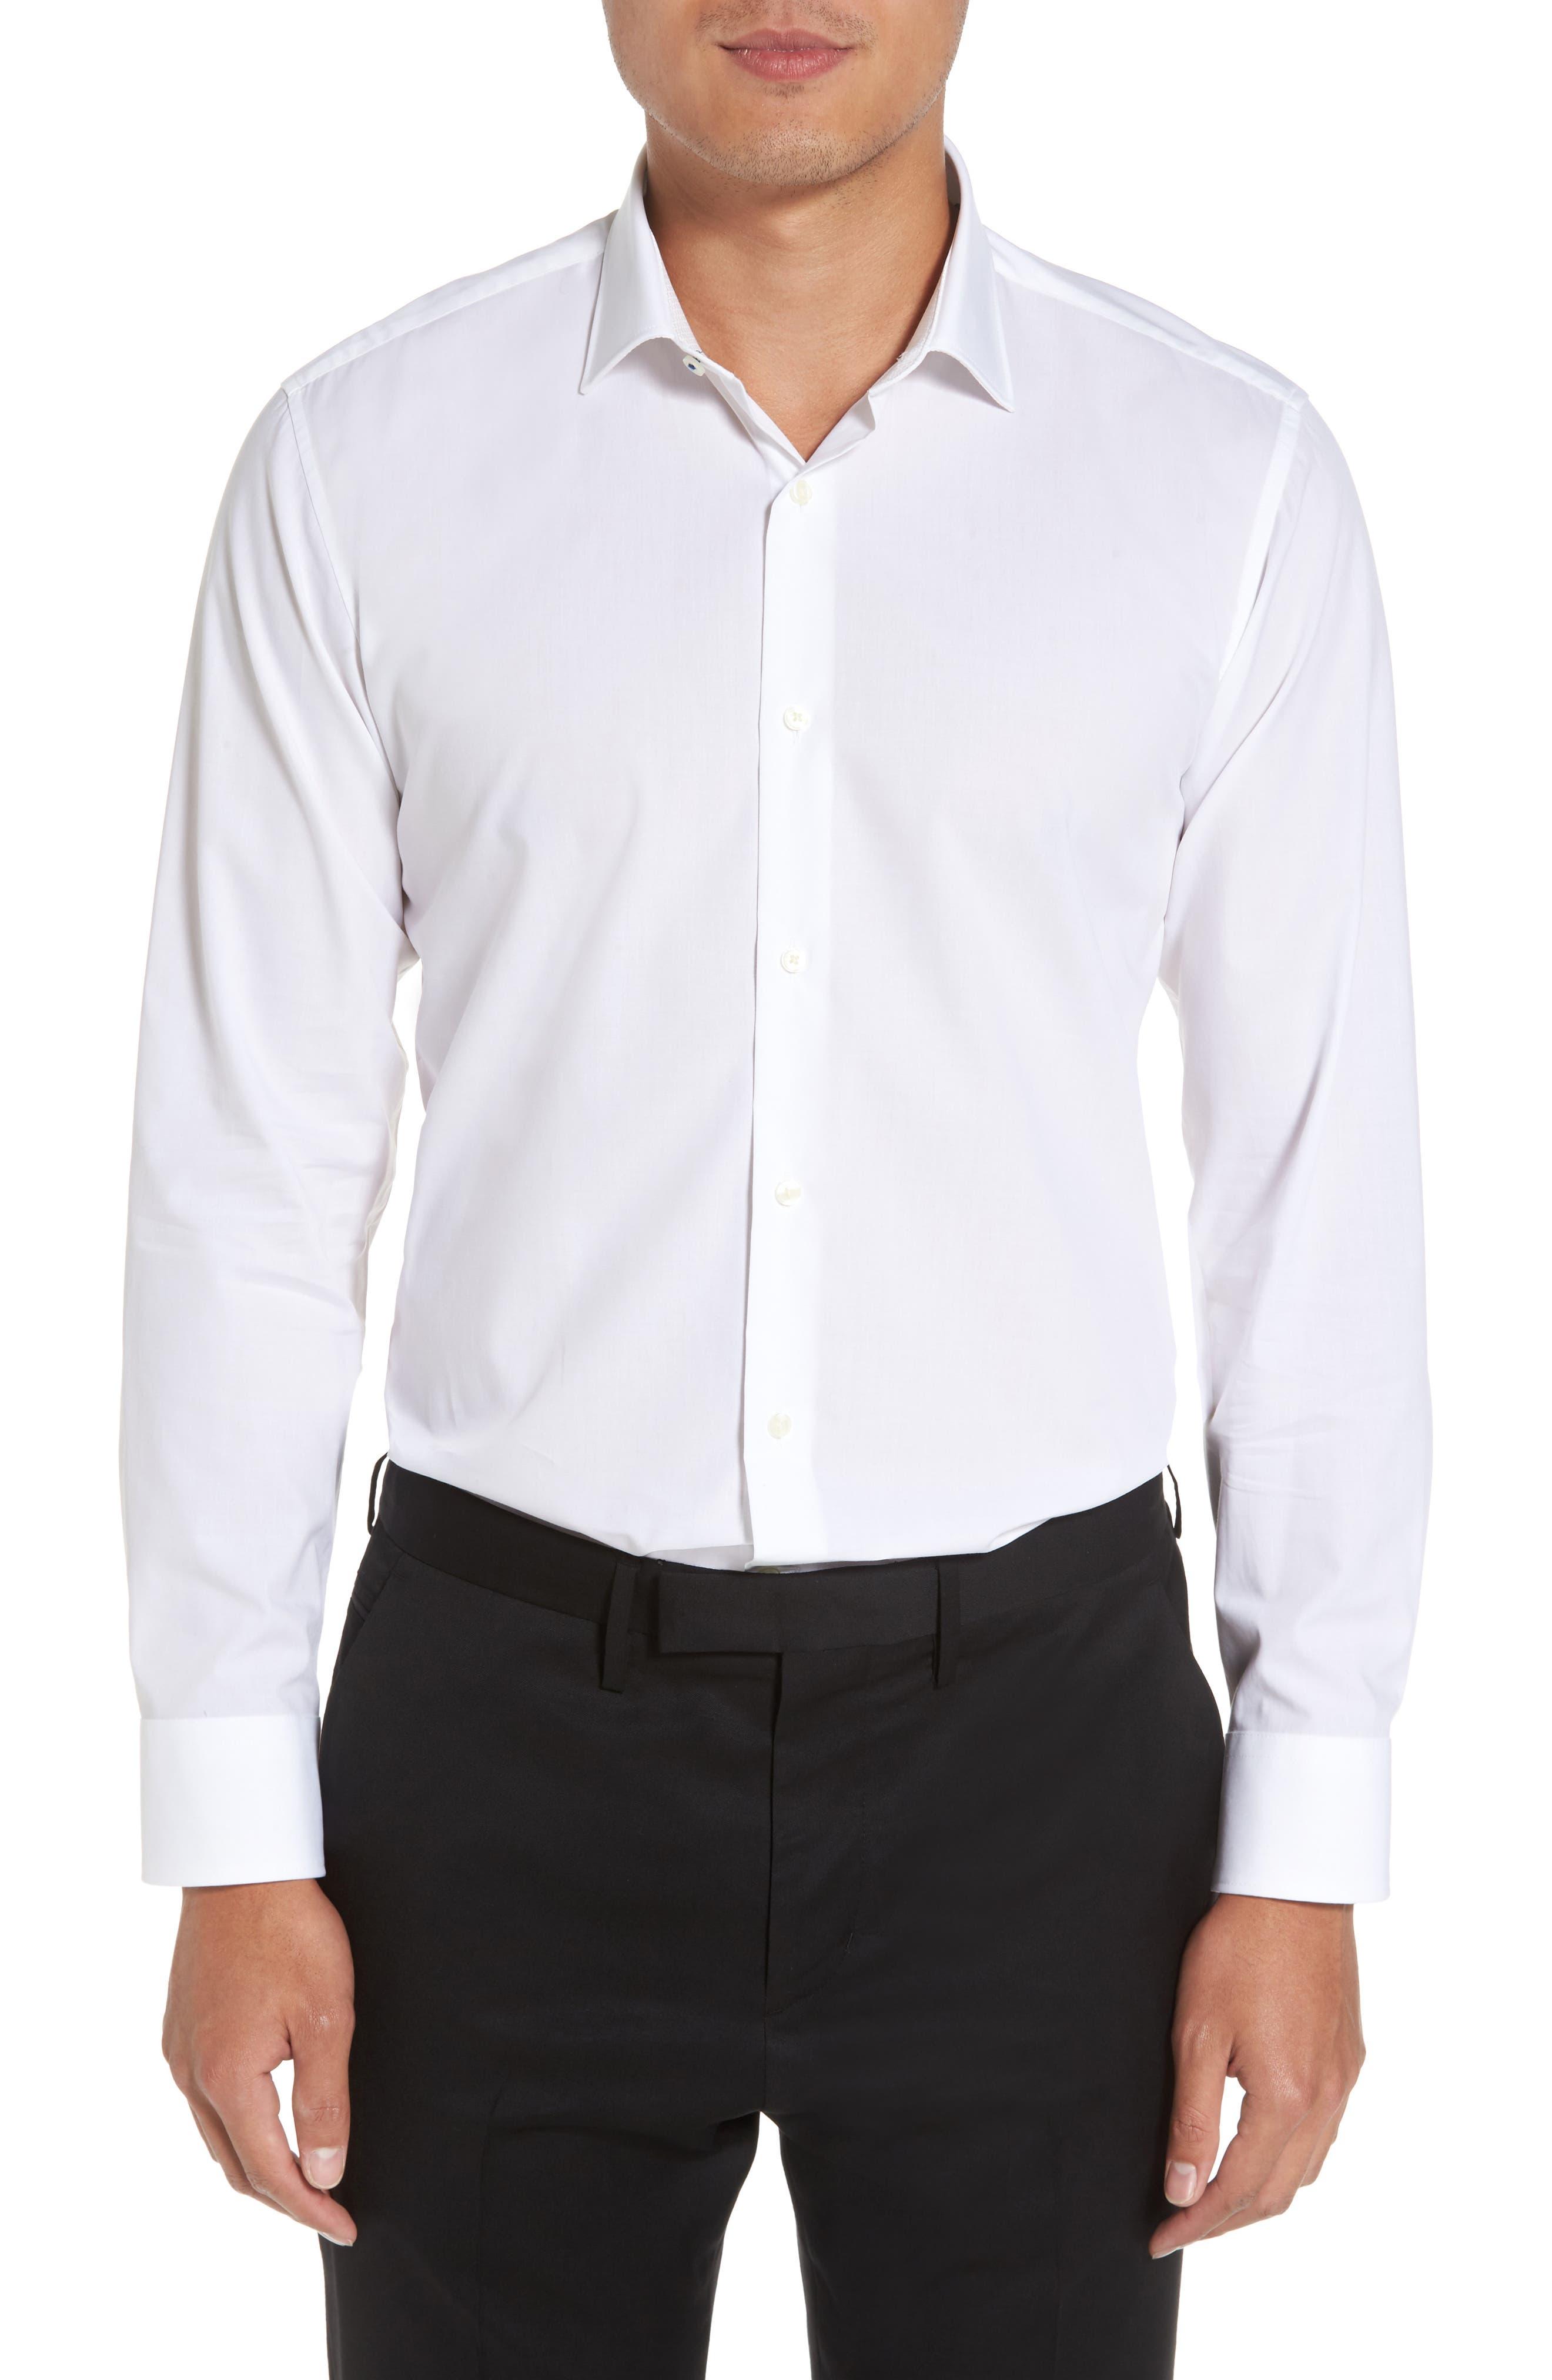 Booker Slim Fit Dress Shirt,                             Main thumbnail 1, color,                             110